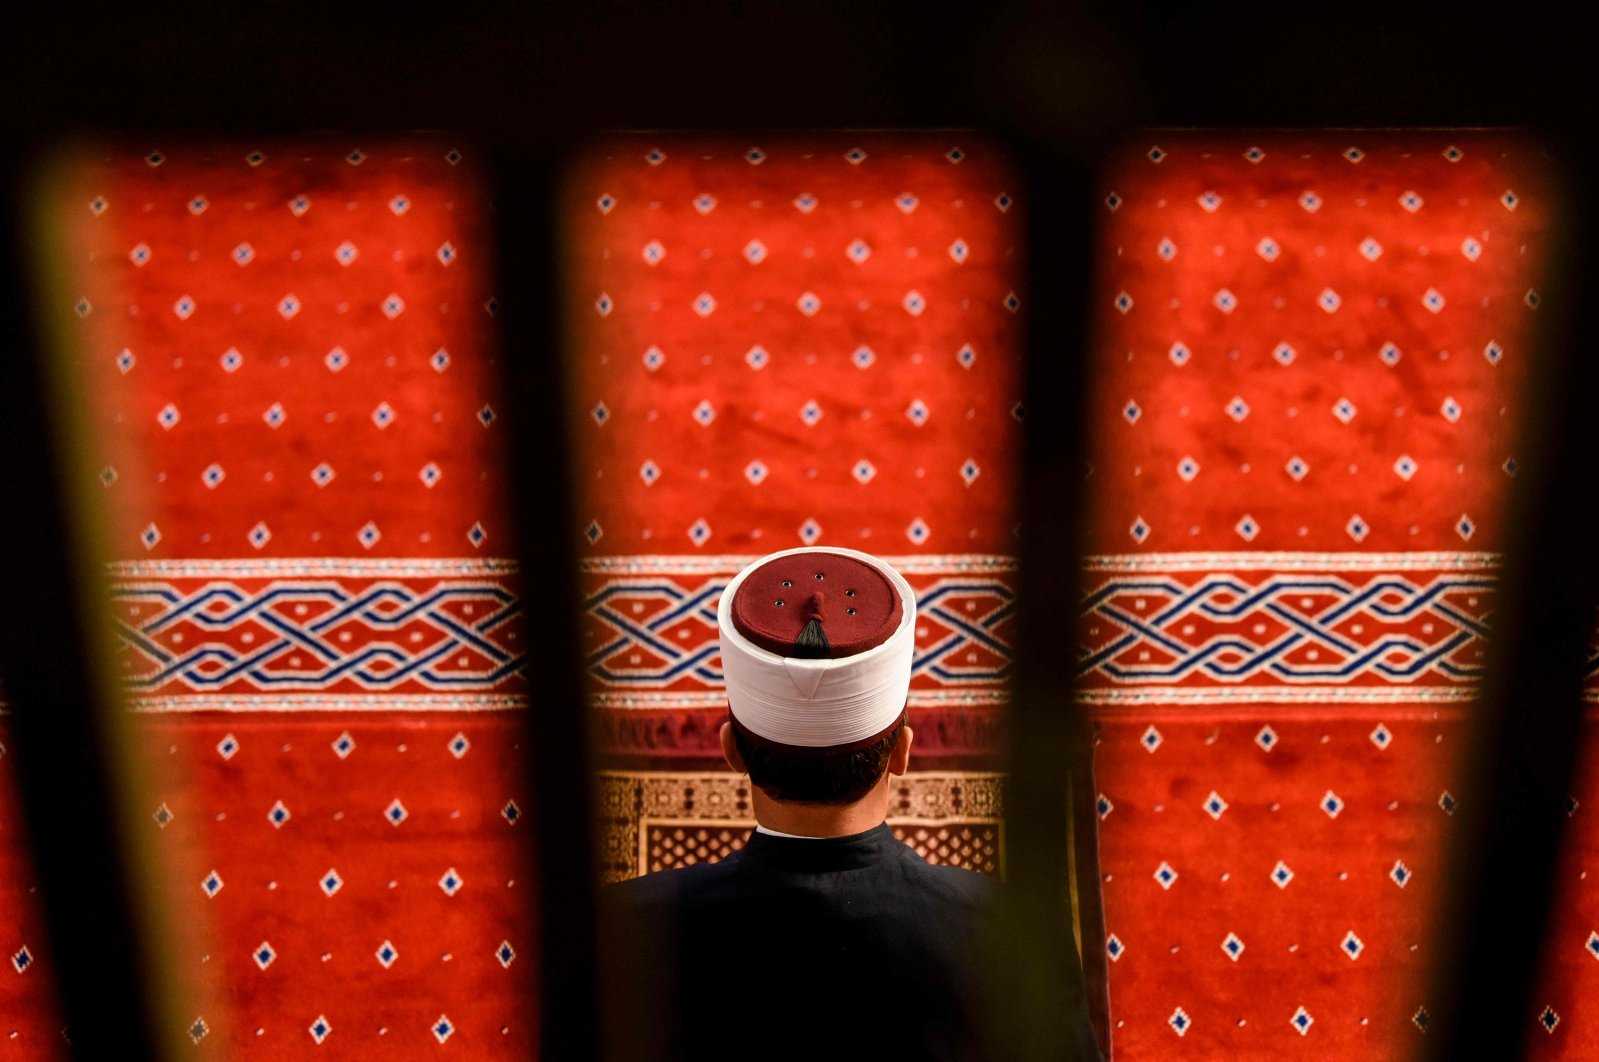 An imam attends Eid al-Fitr prayers, at the Grand Mosque, Pristina, Kosova, May 24, 2020. (AFP Photo)